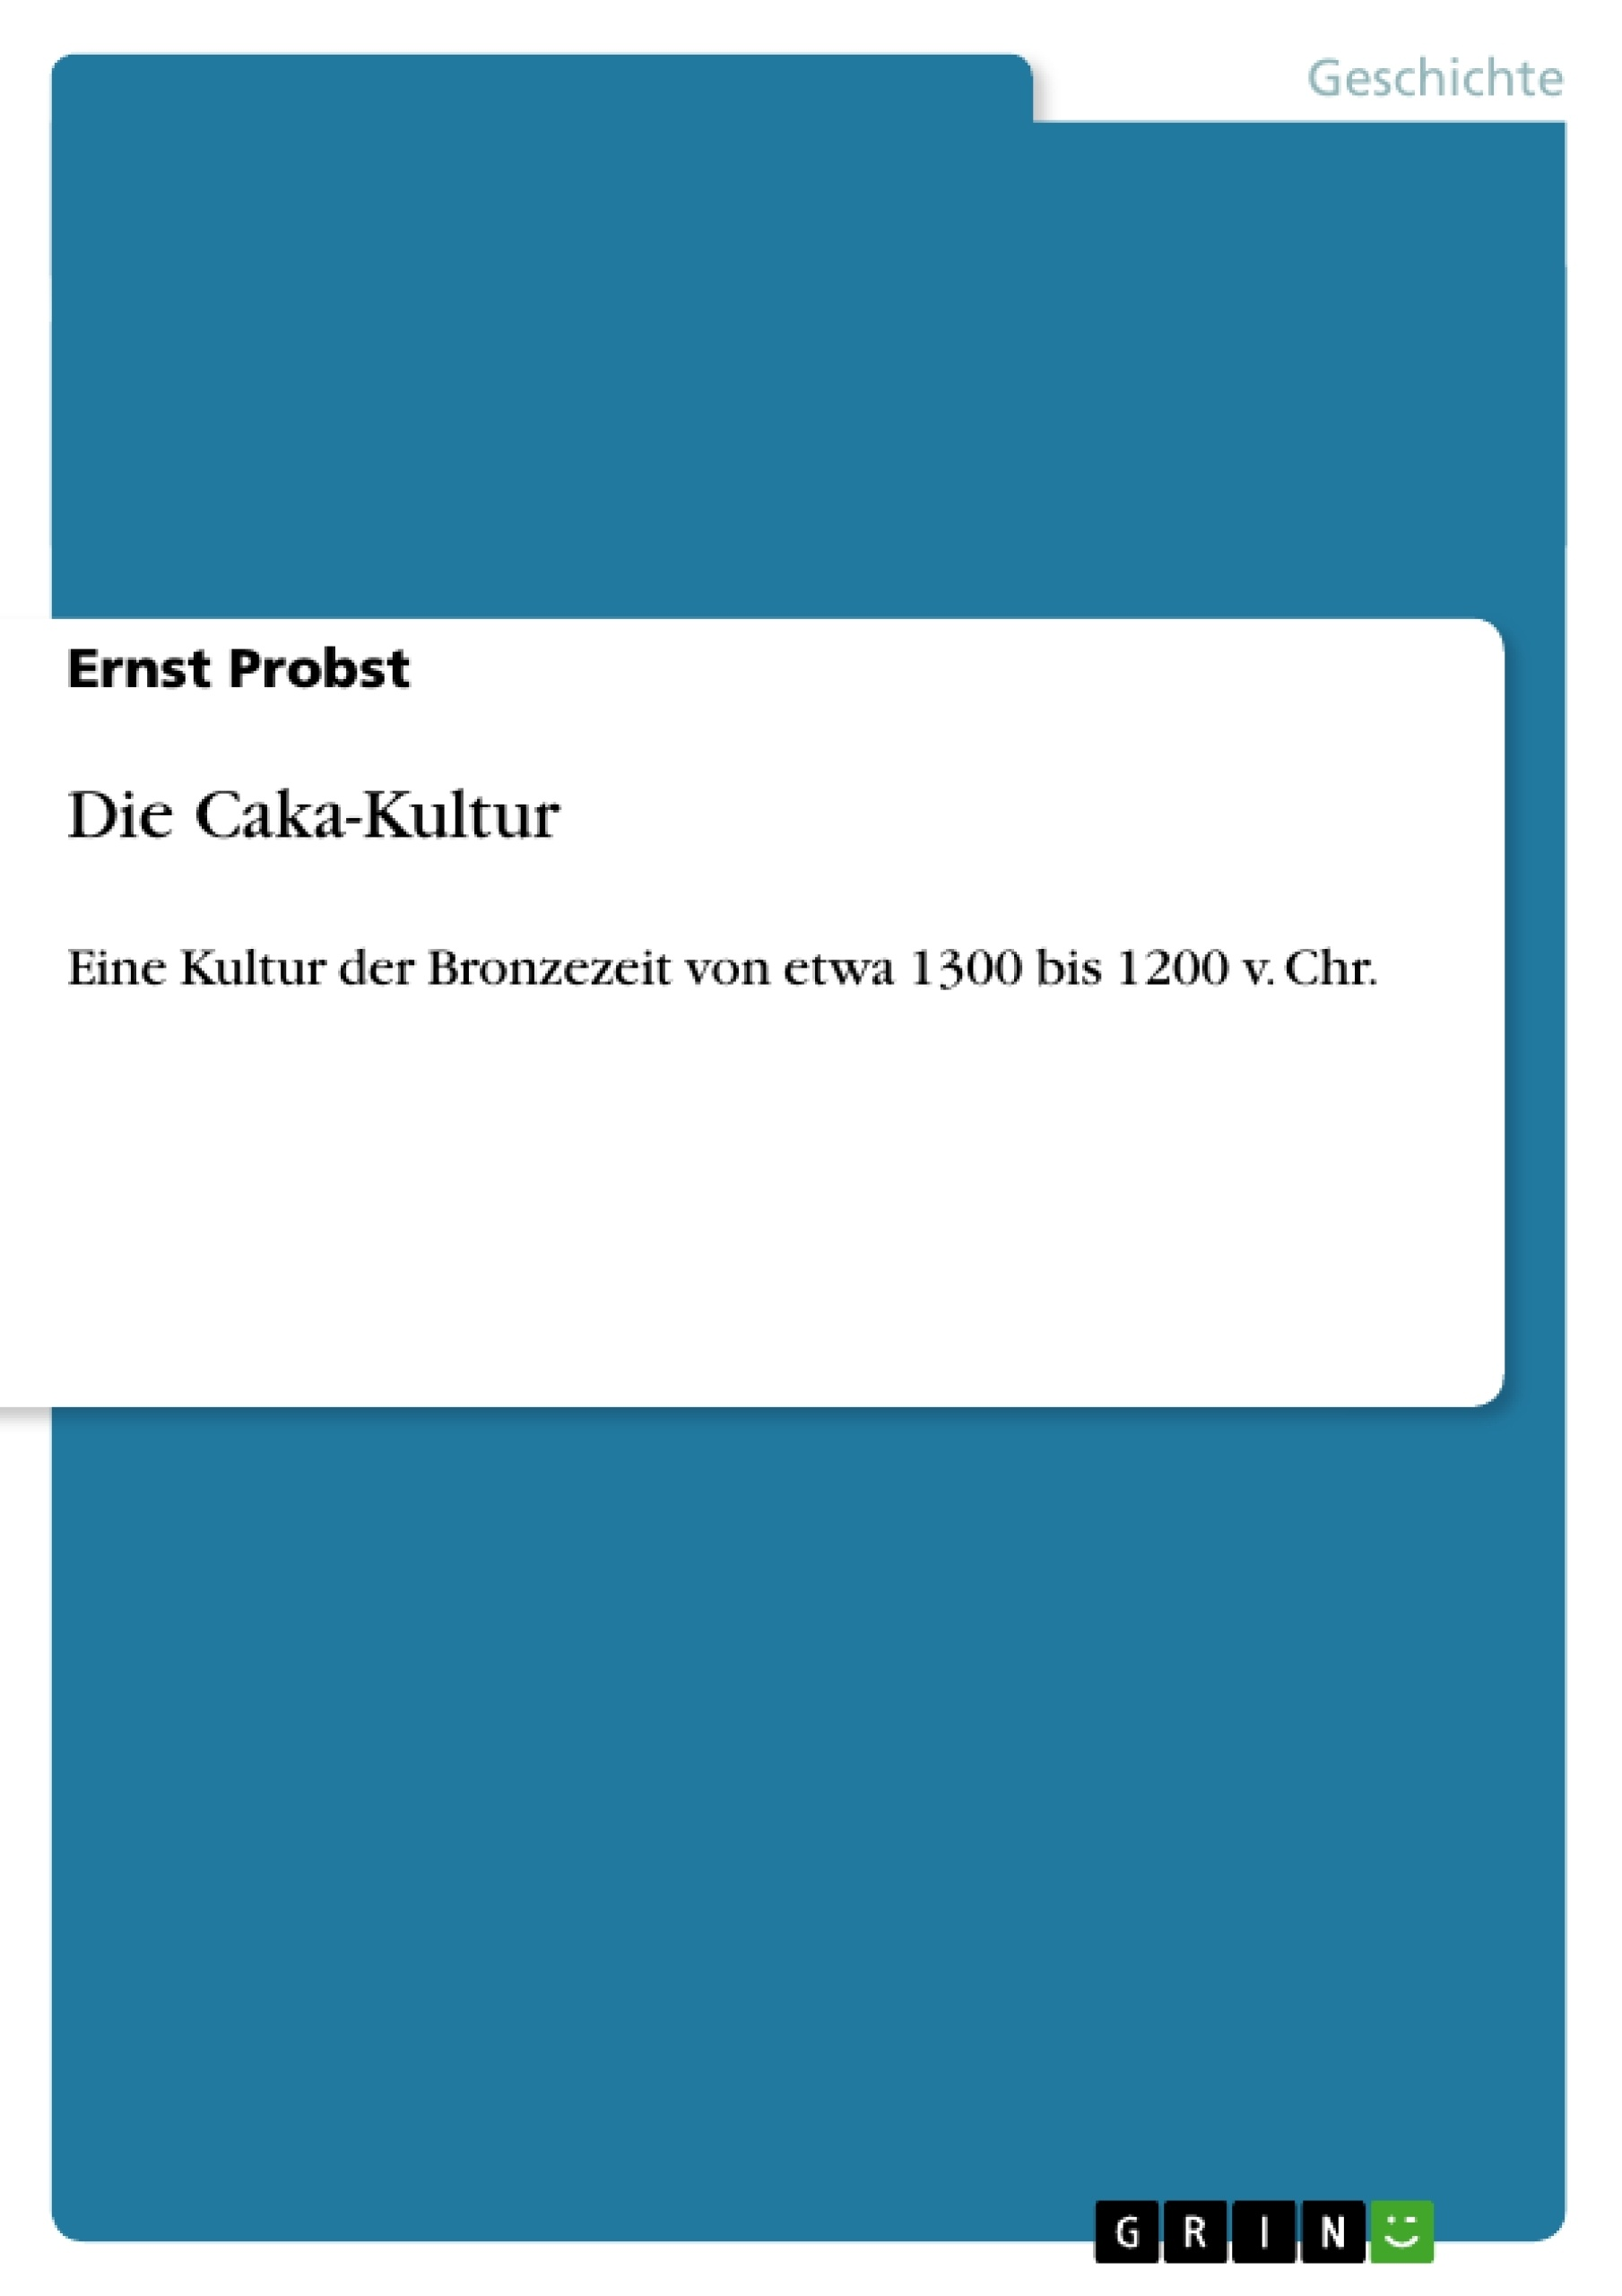 Titel: Die Caka-Kultur